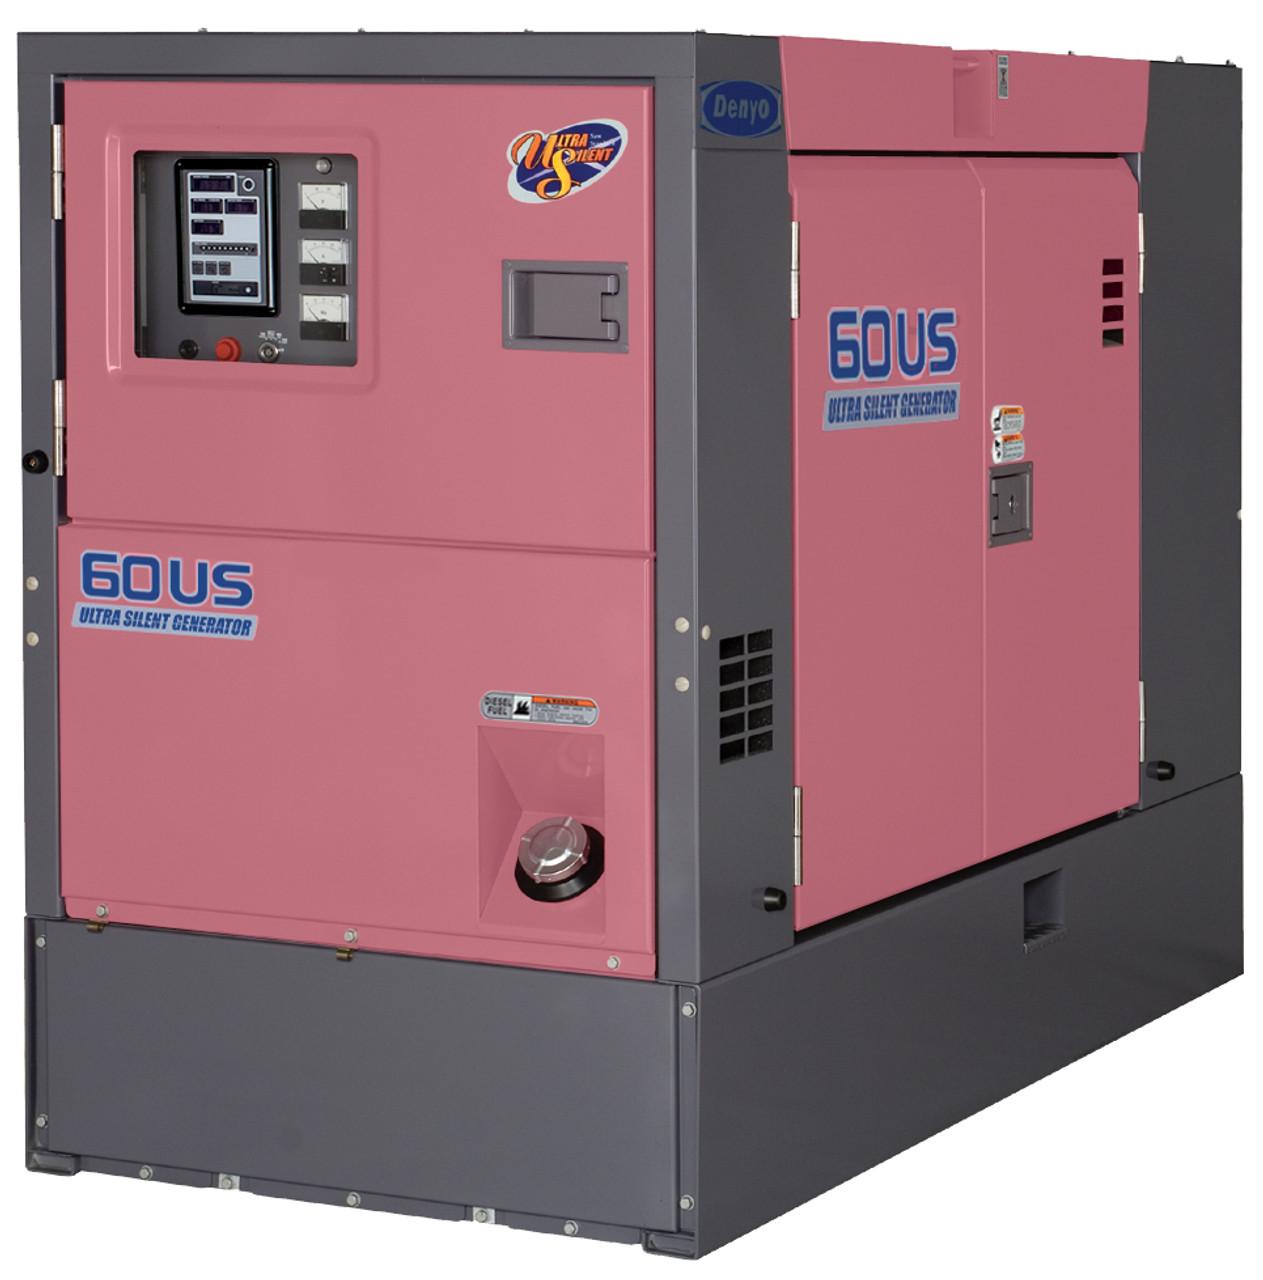 DENYO 60KVA Diesel Generator - 3 Phase - DCA-60USH2 - Ultra Silenced